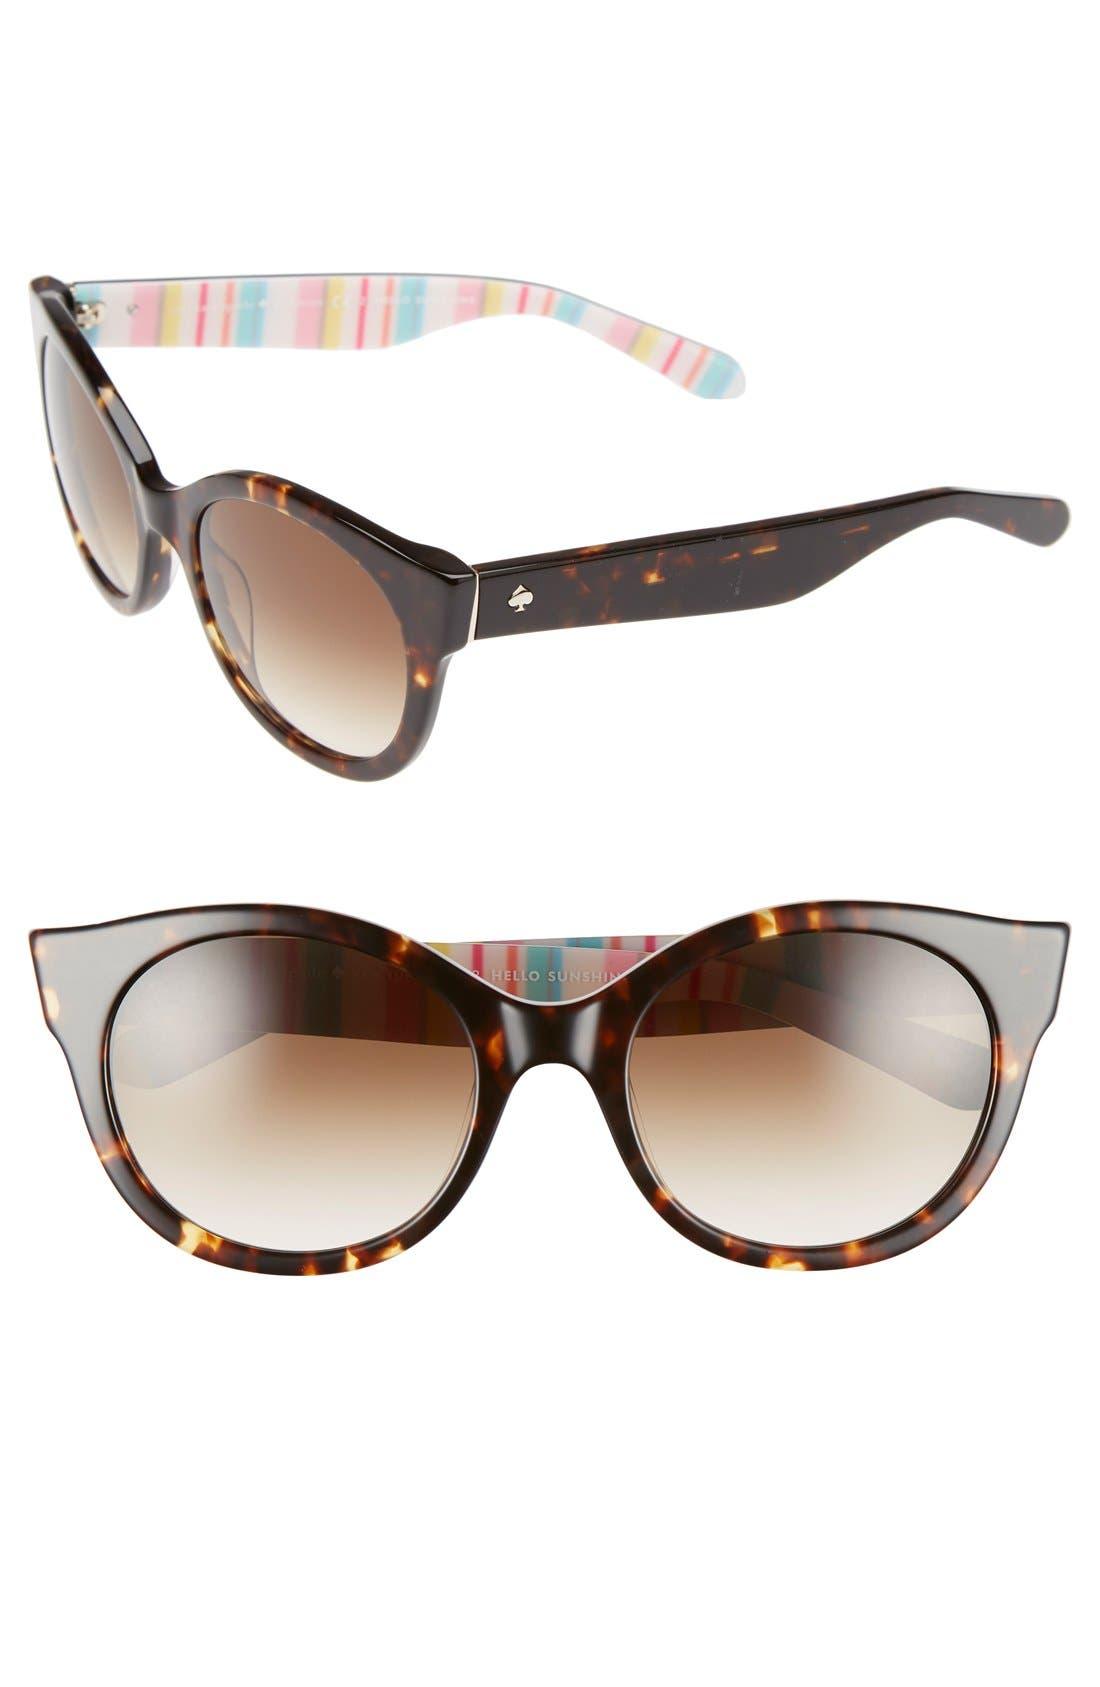 Alternate Image 1 Selected - kate spade new york 'melly' 53mm sunglasses